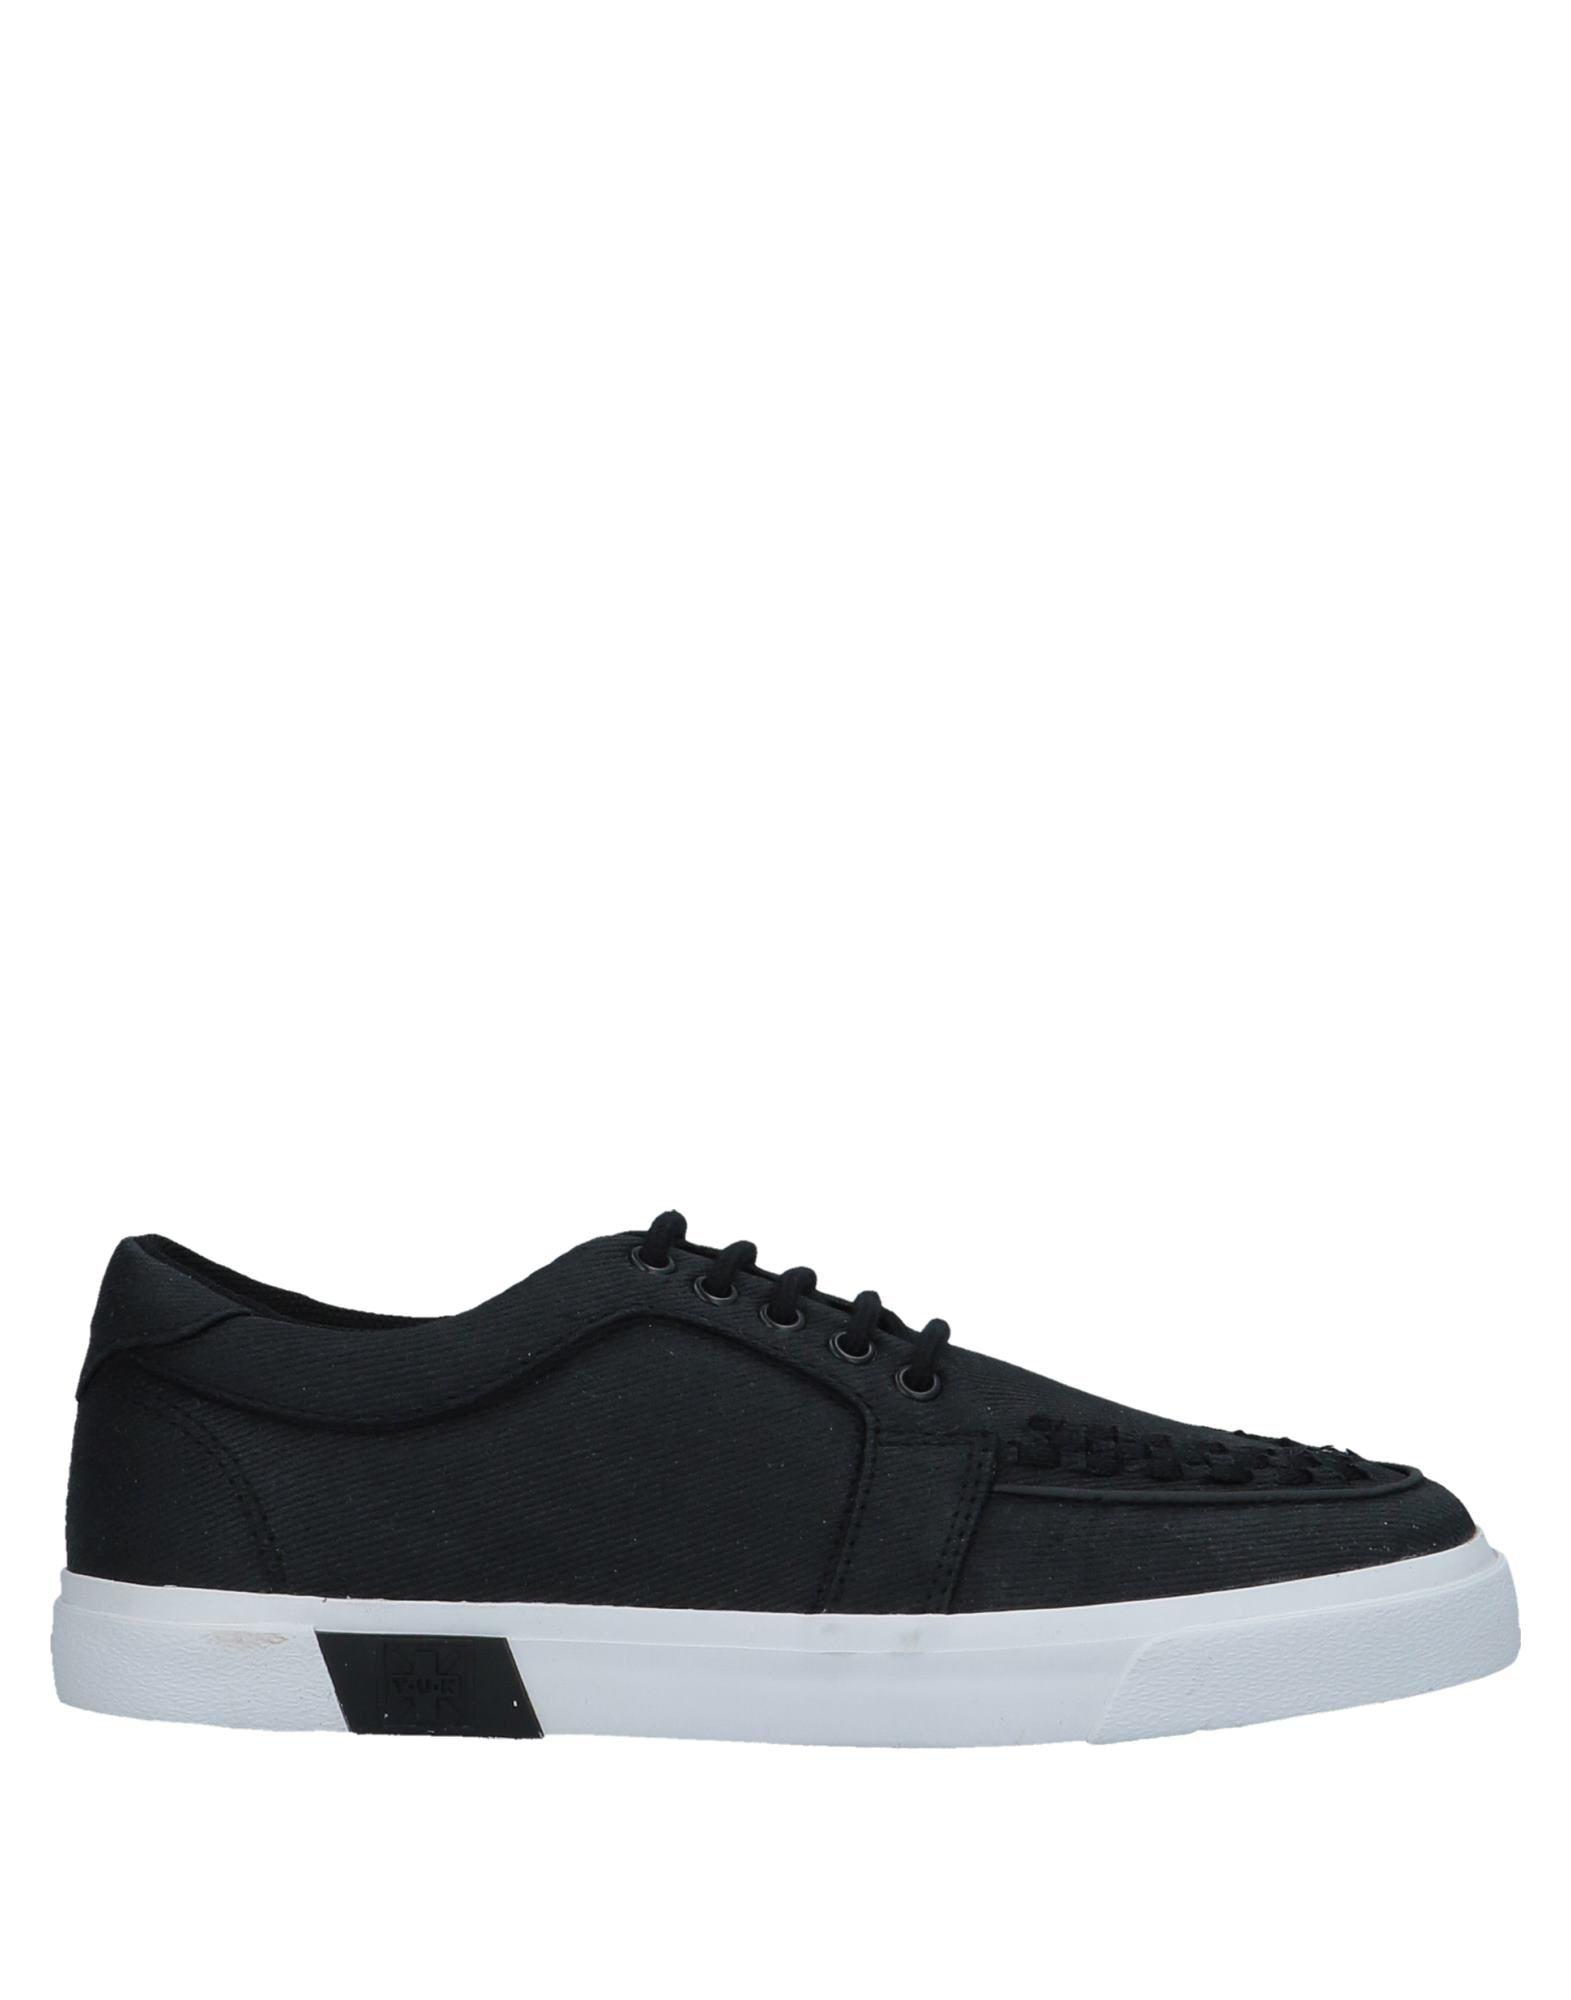 T.U.K Sneakers Damen  11522506NR Gute Qualität beliebte Schuhe